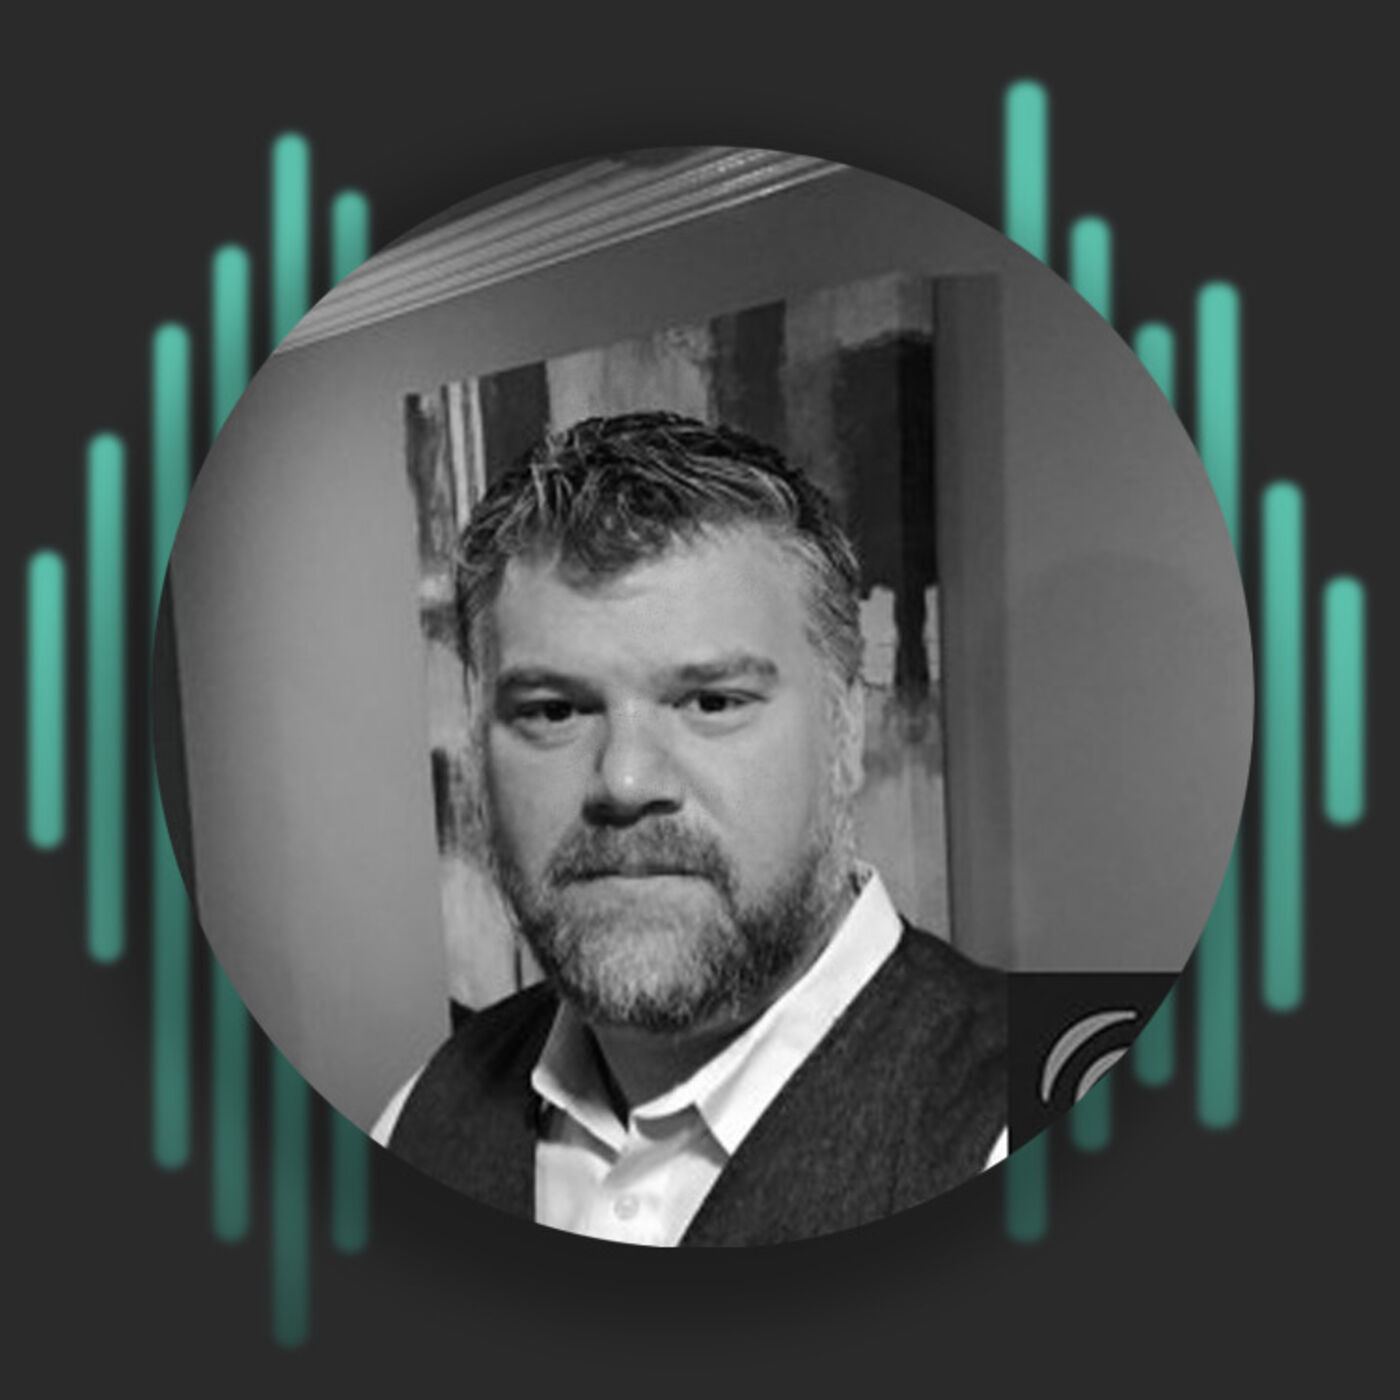 Episode 2: Mathew Nelson D.O. Emergency Medicine Program Director